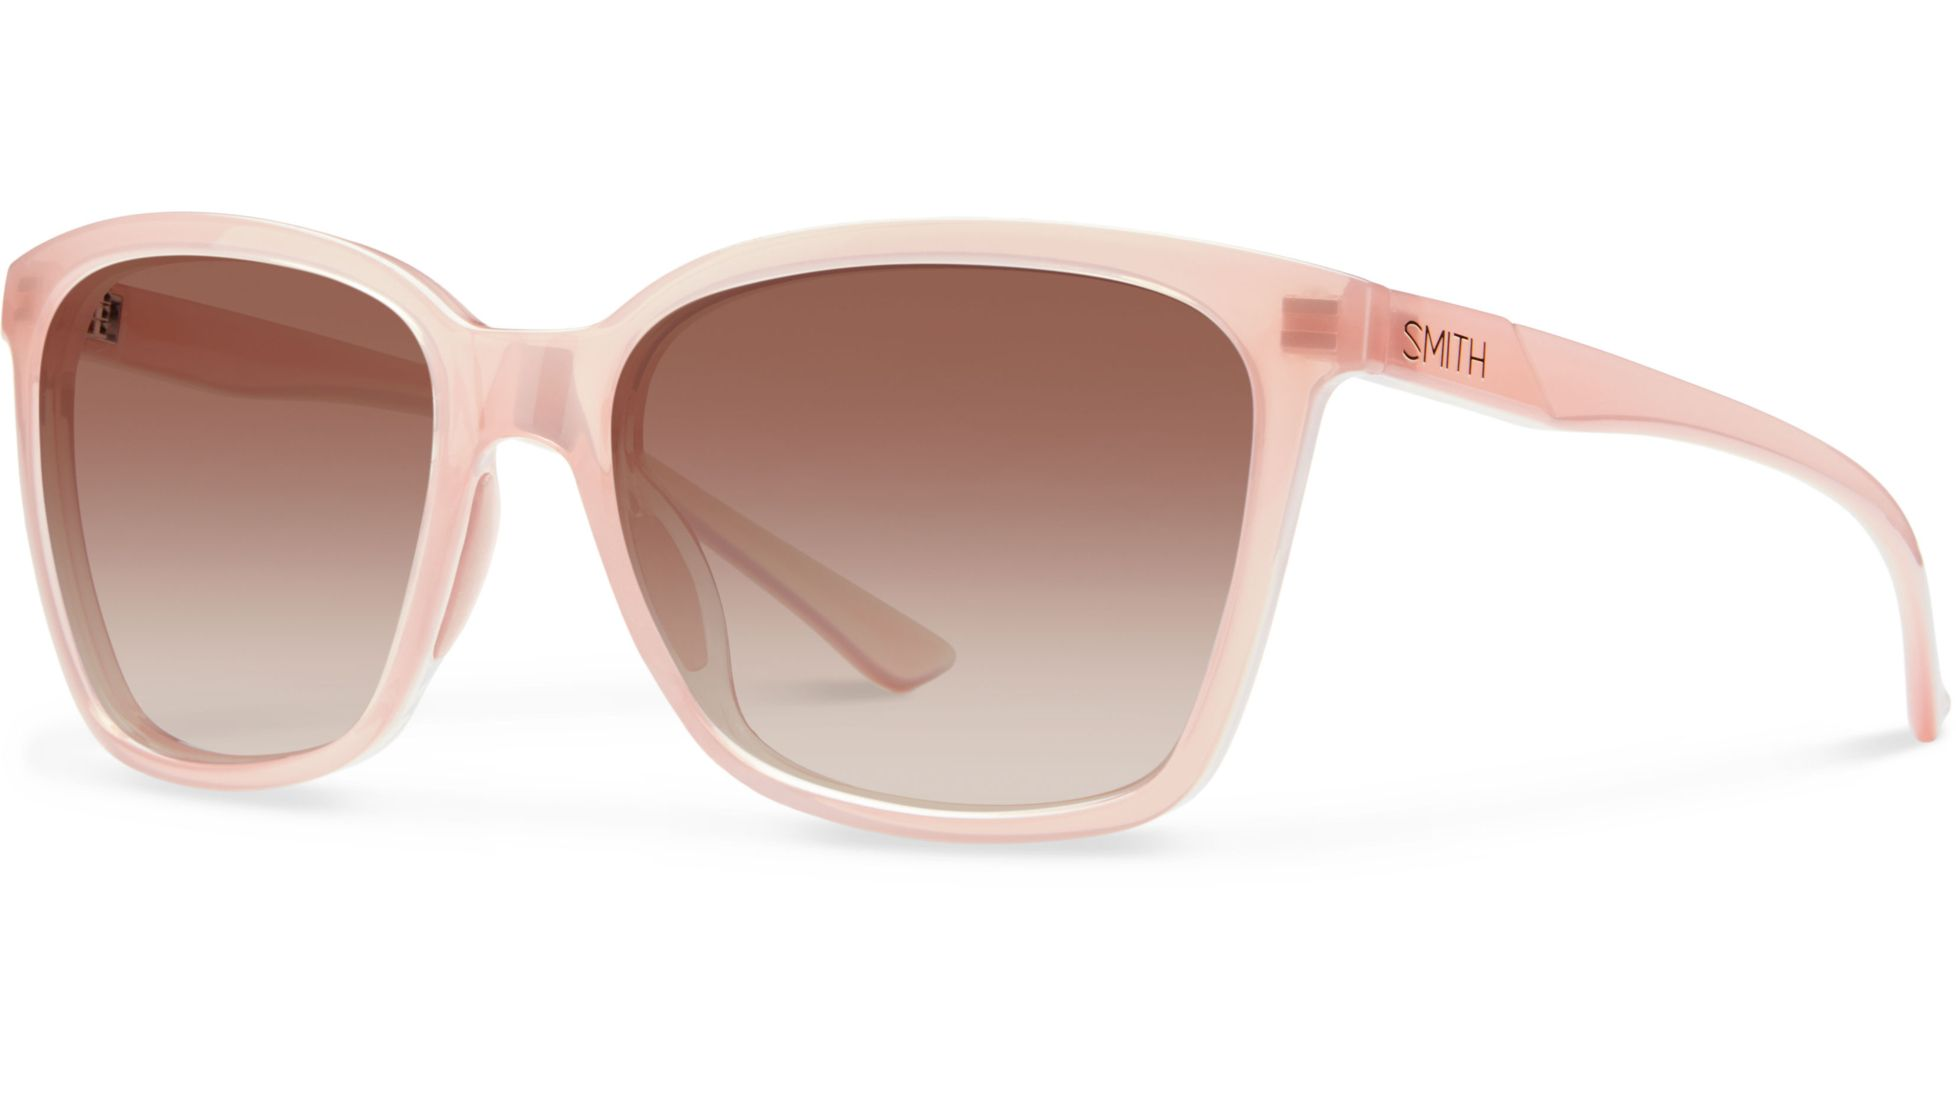 Colette 55mm Sunglasses | Nordstrom | Sunglasses, Cool